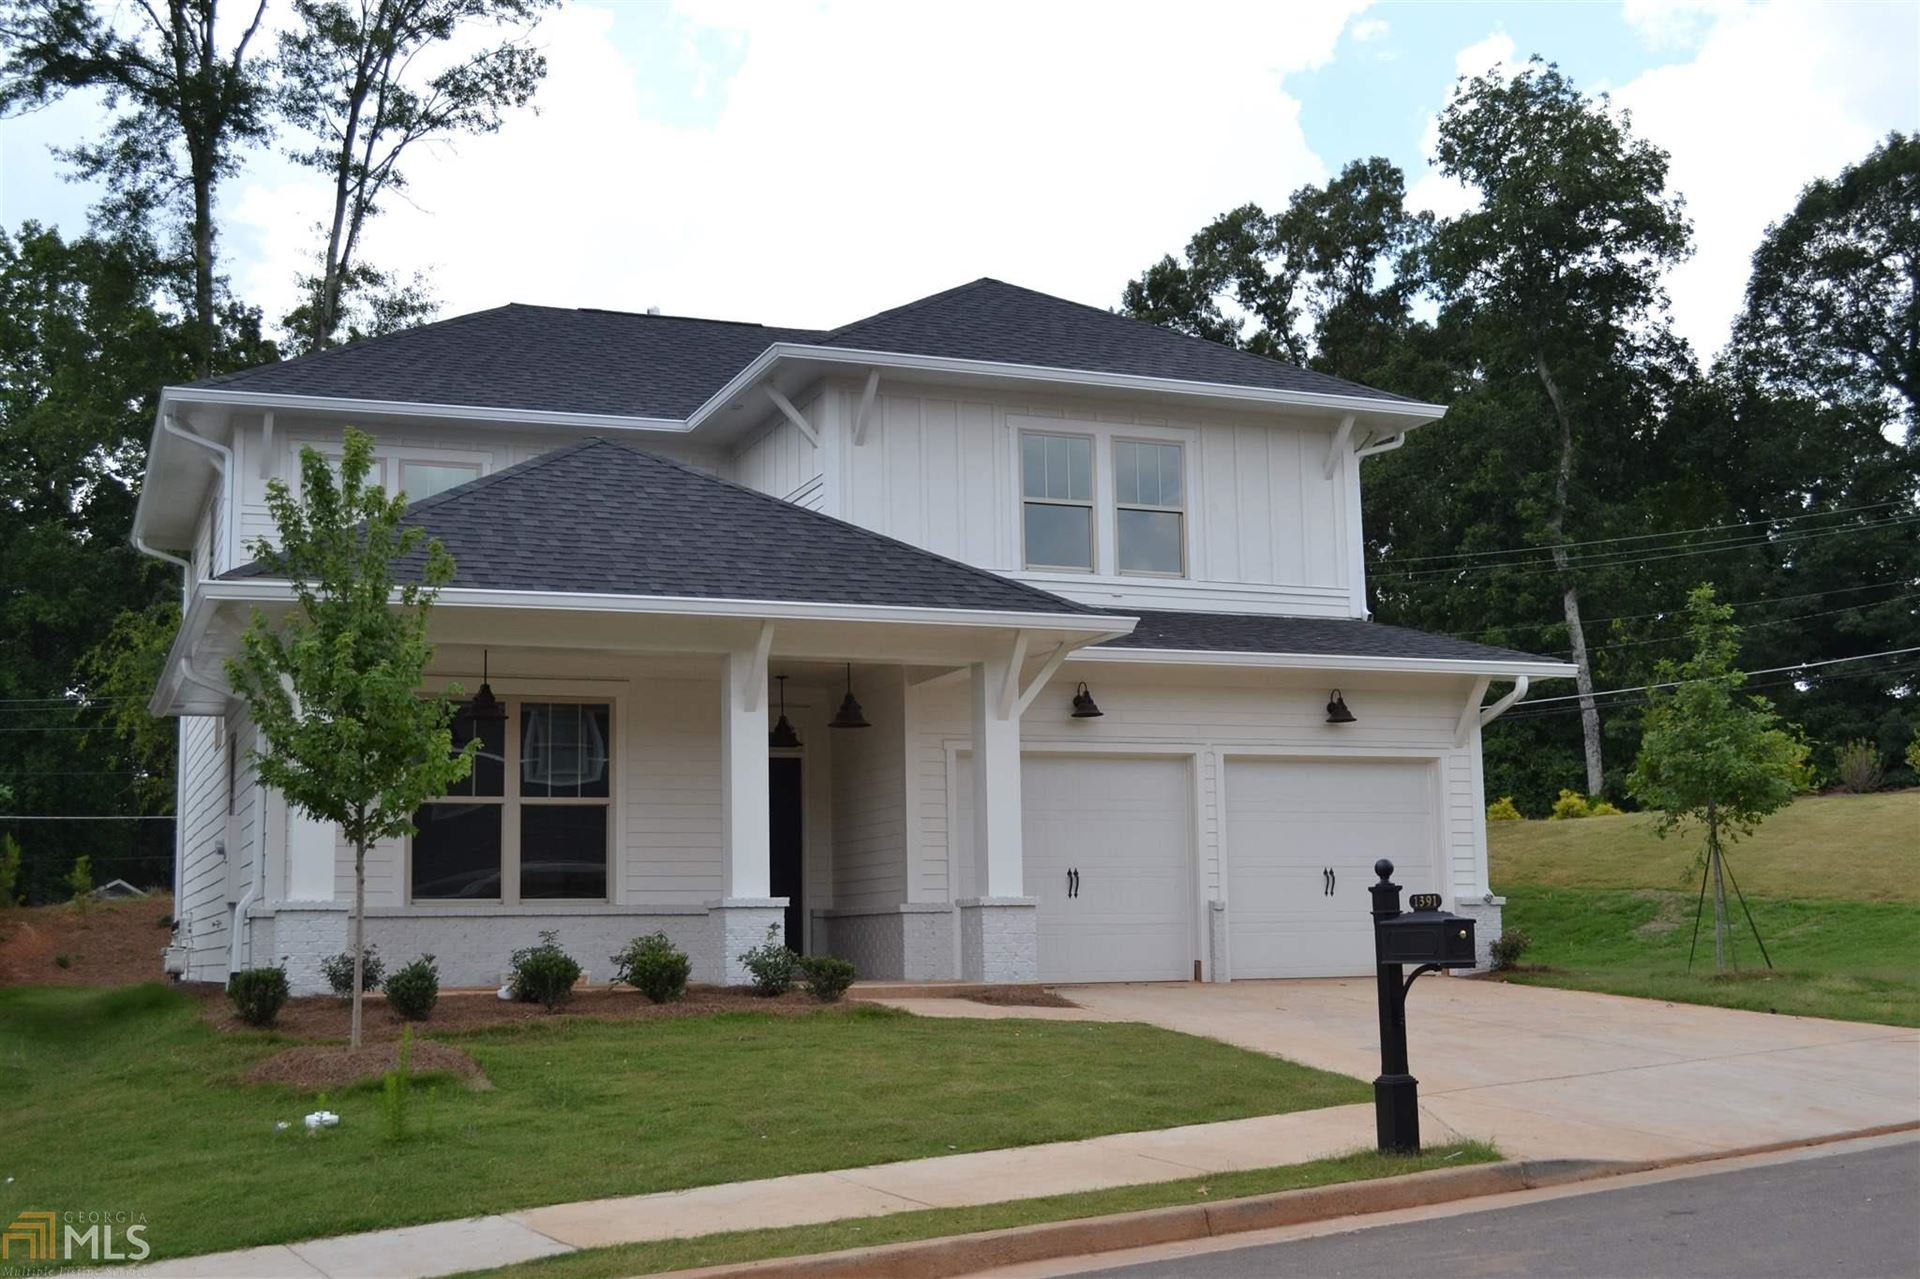 1391 Sugarmill Oaks Ave, Atlanta, GA 30316 - MLS#: 8815622